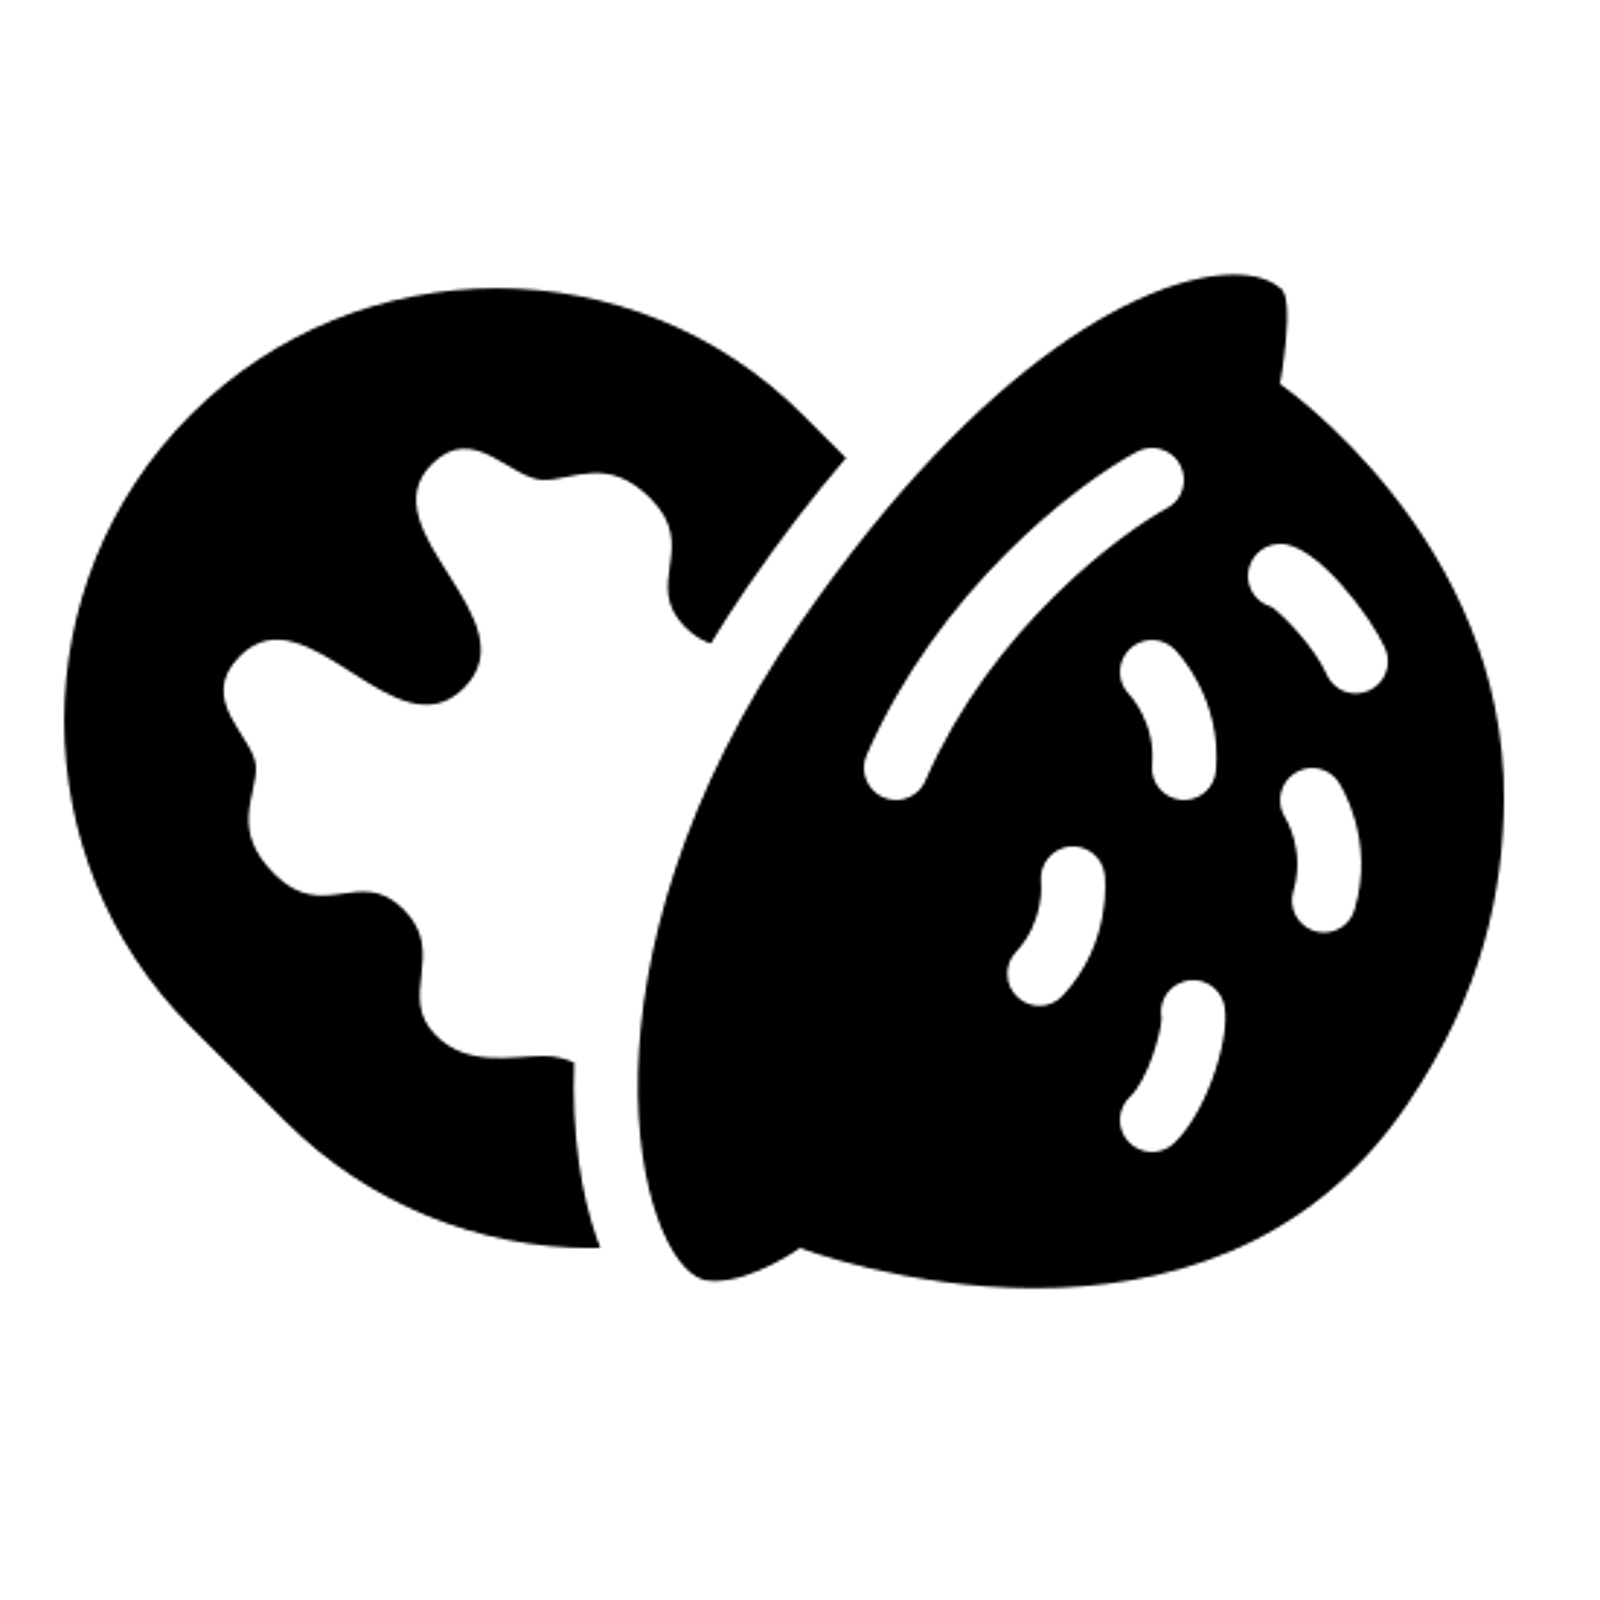 Sedno icon